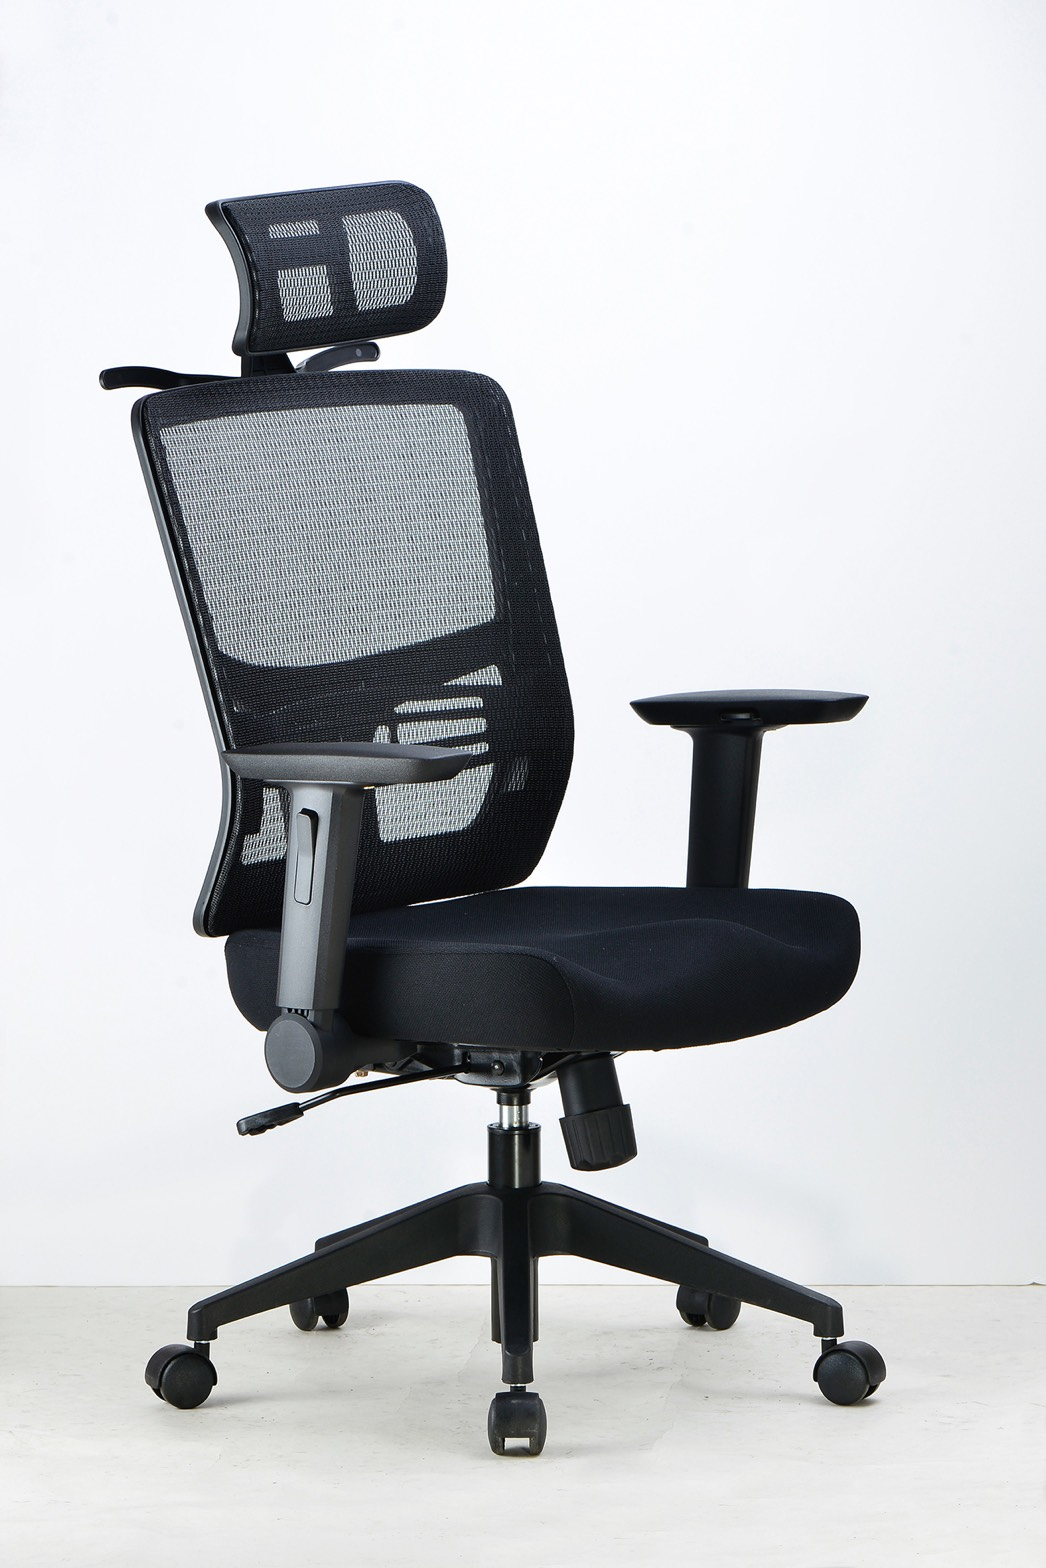 JE-0910-1   抗疫  造型人體工學網椅  辦公椅